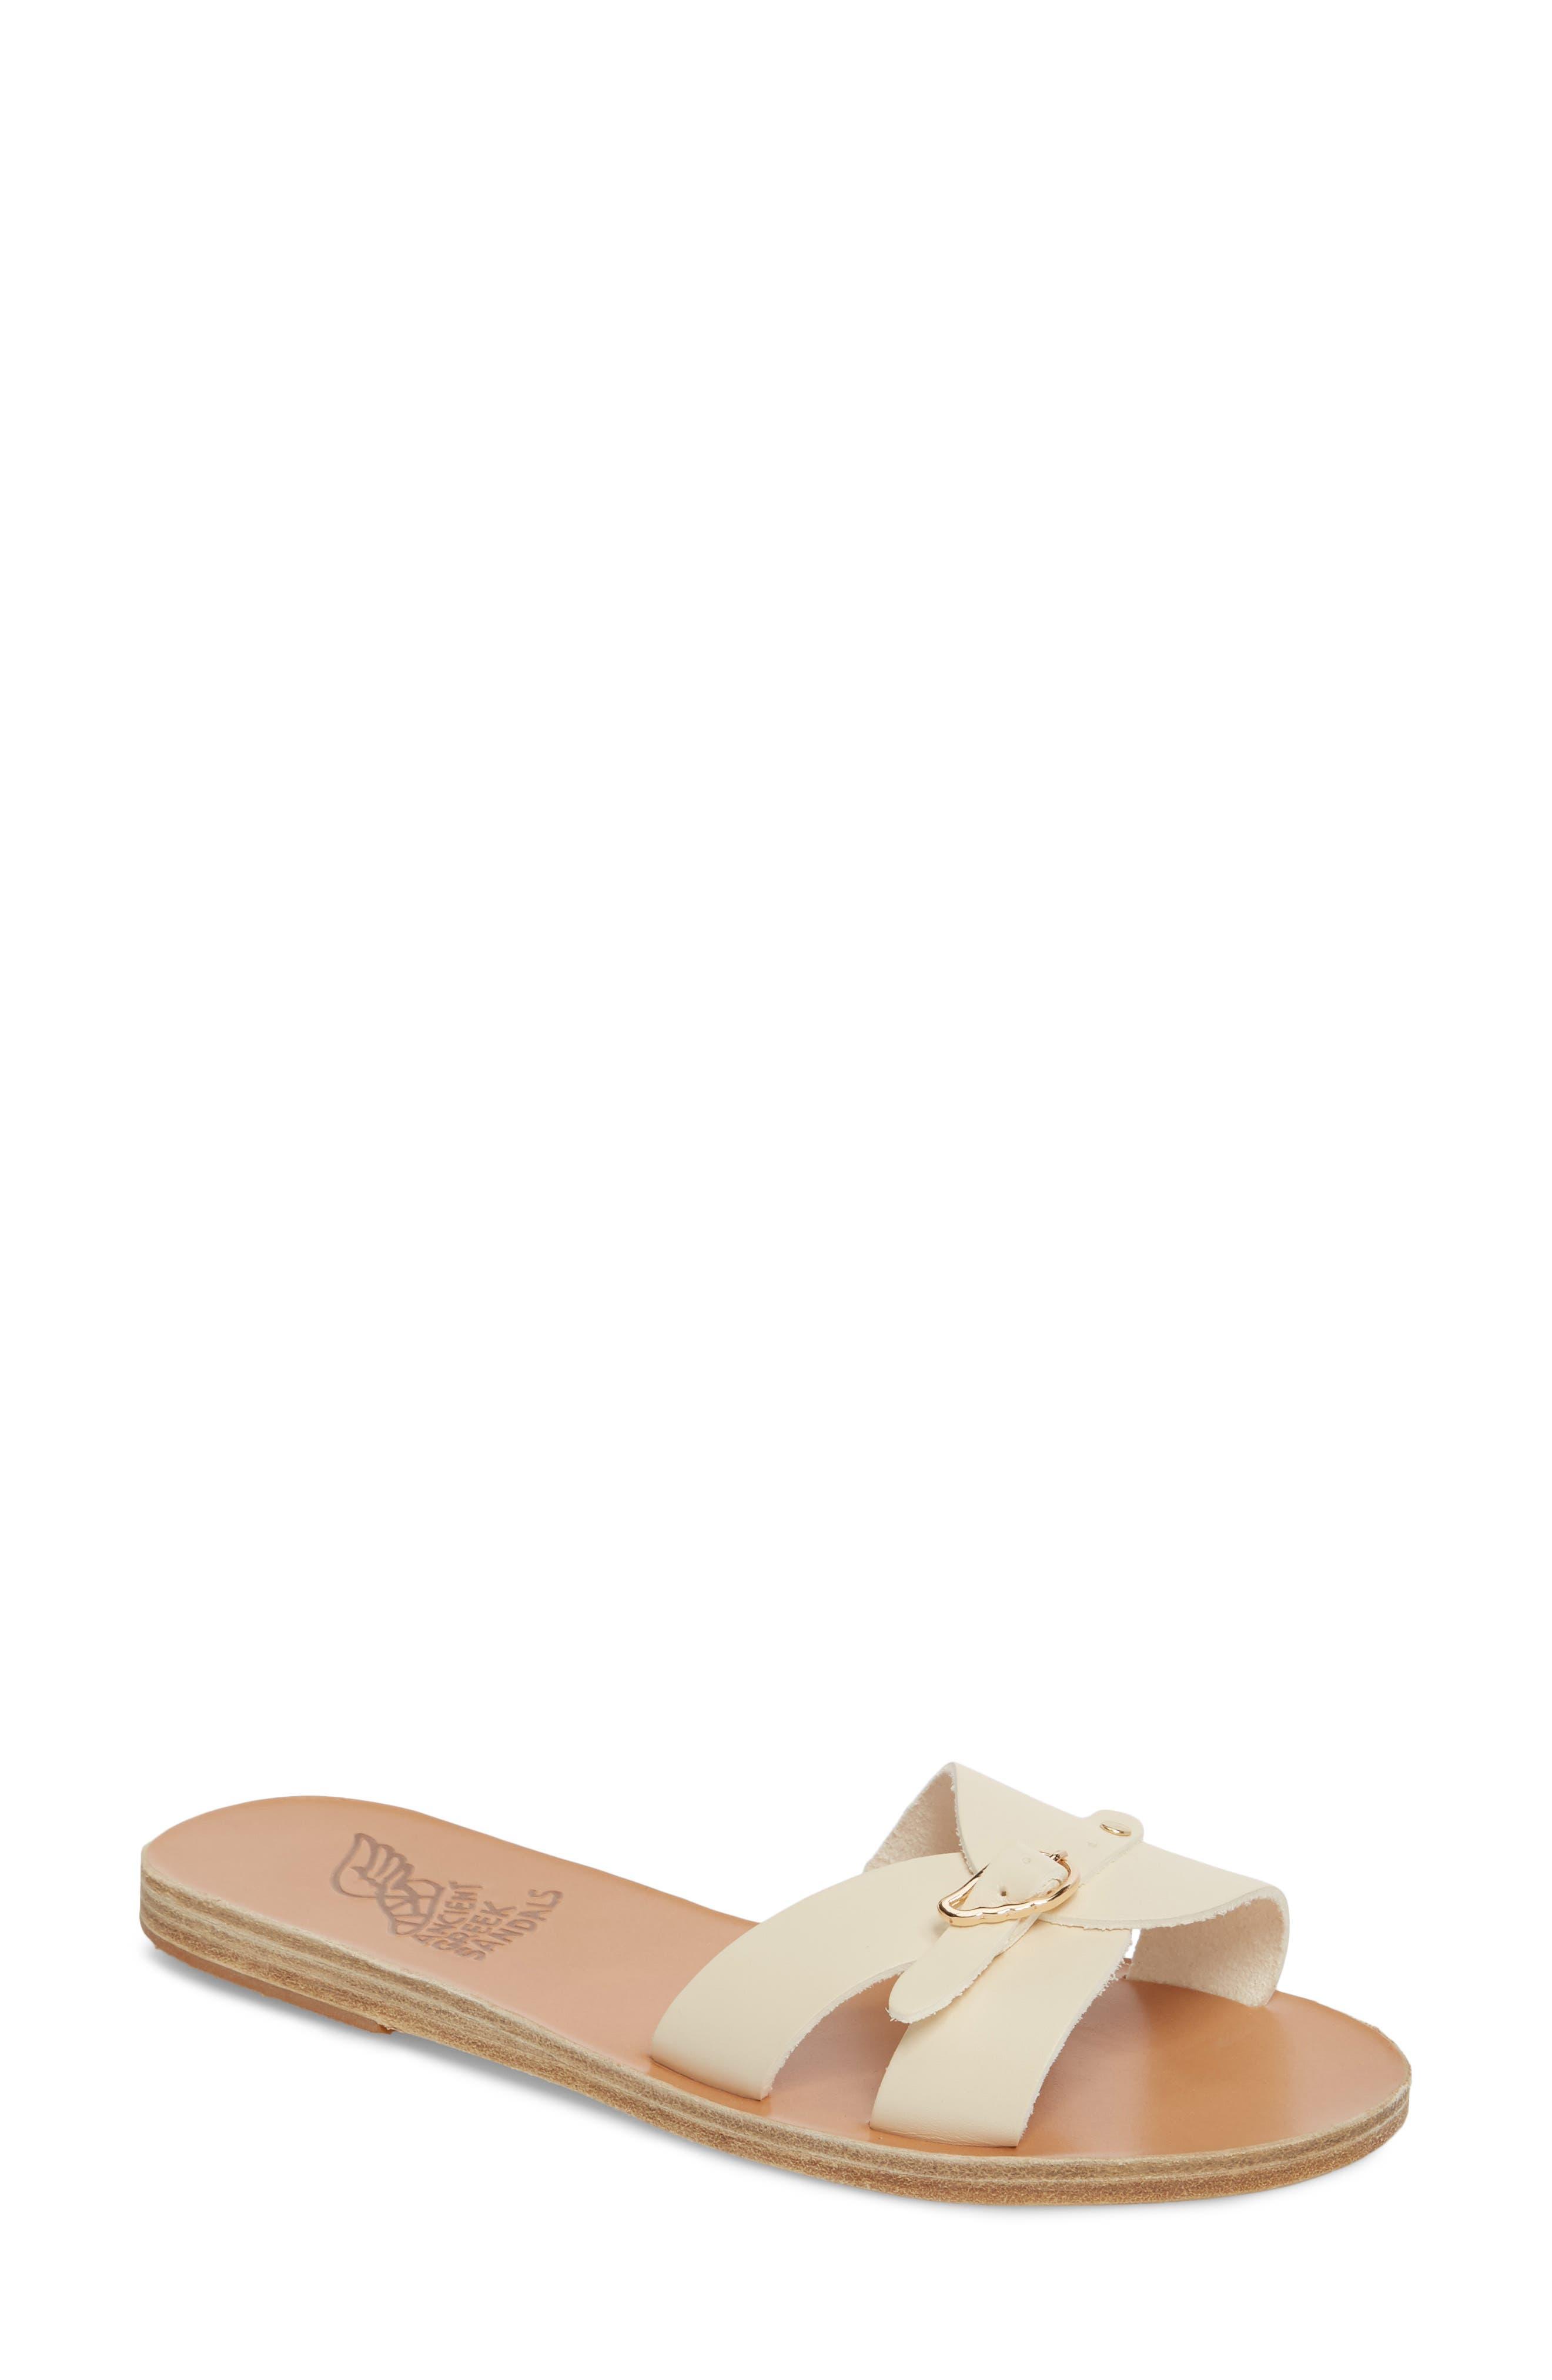 Ancient Greek Sandals Anna Sandal, Ivory